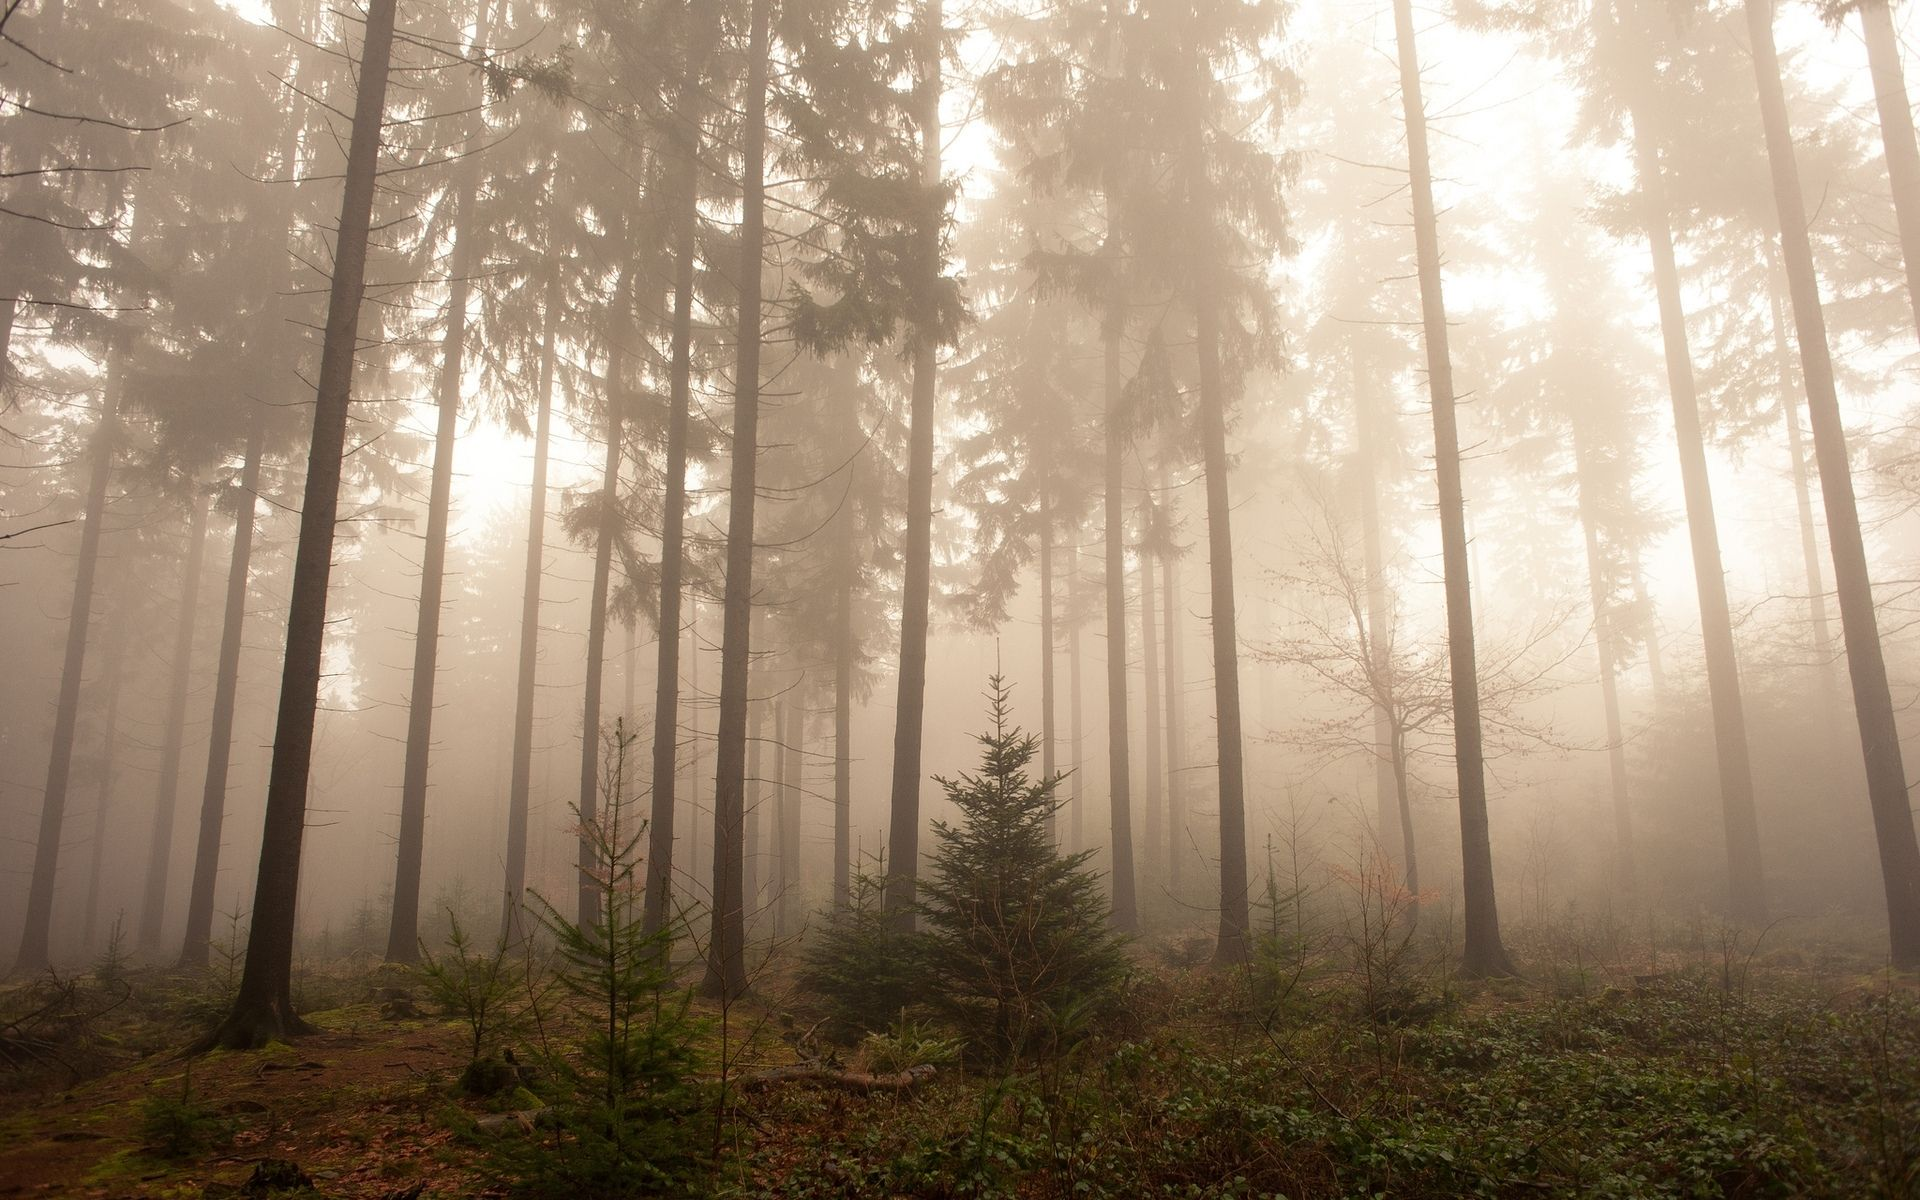 Foggy Forest Wallpaper Foggy forest, Fog images, Forest